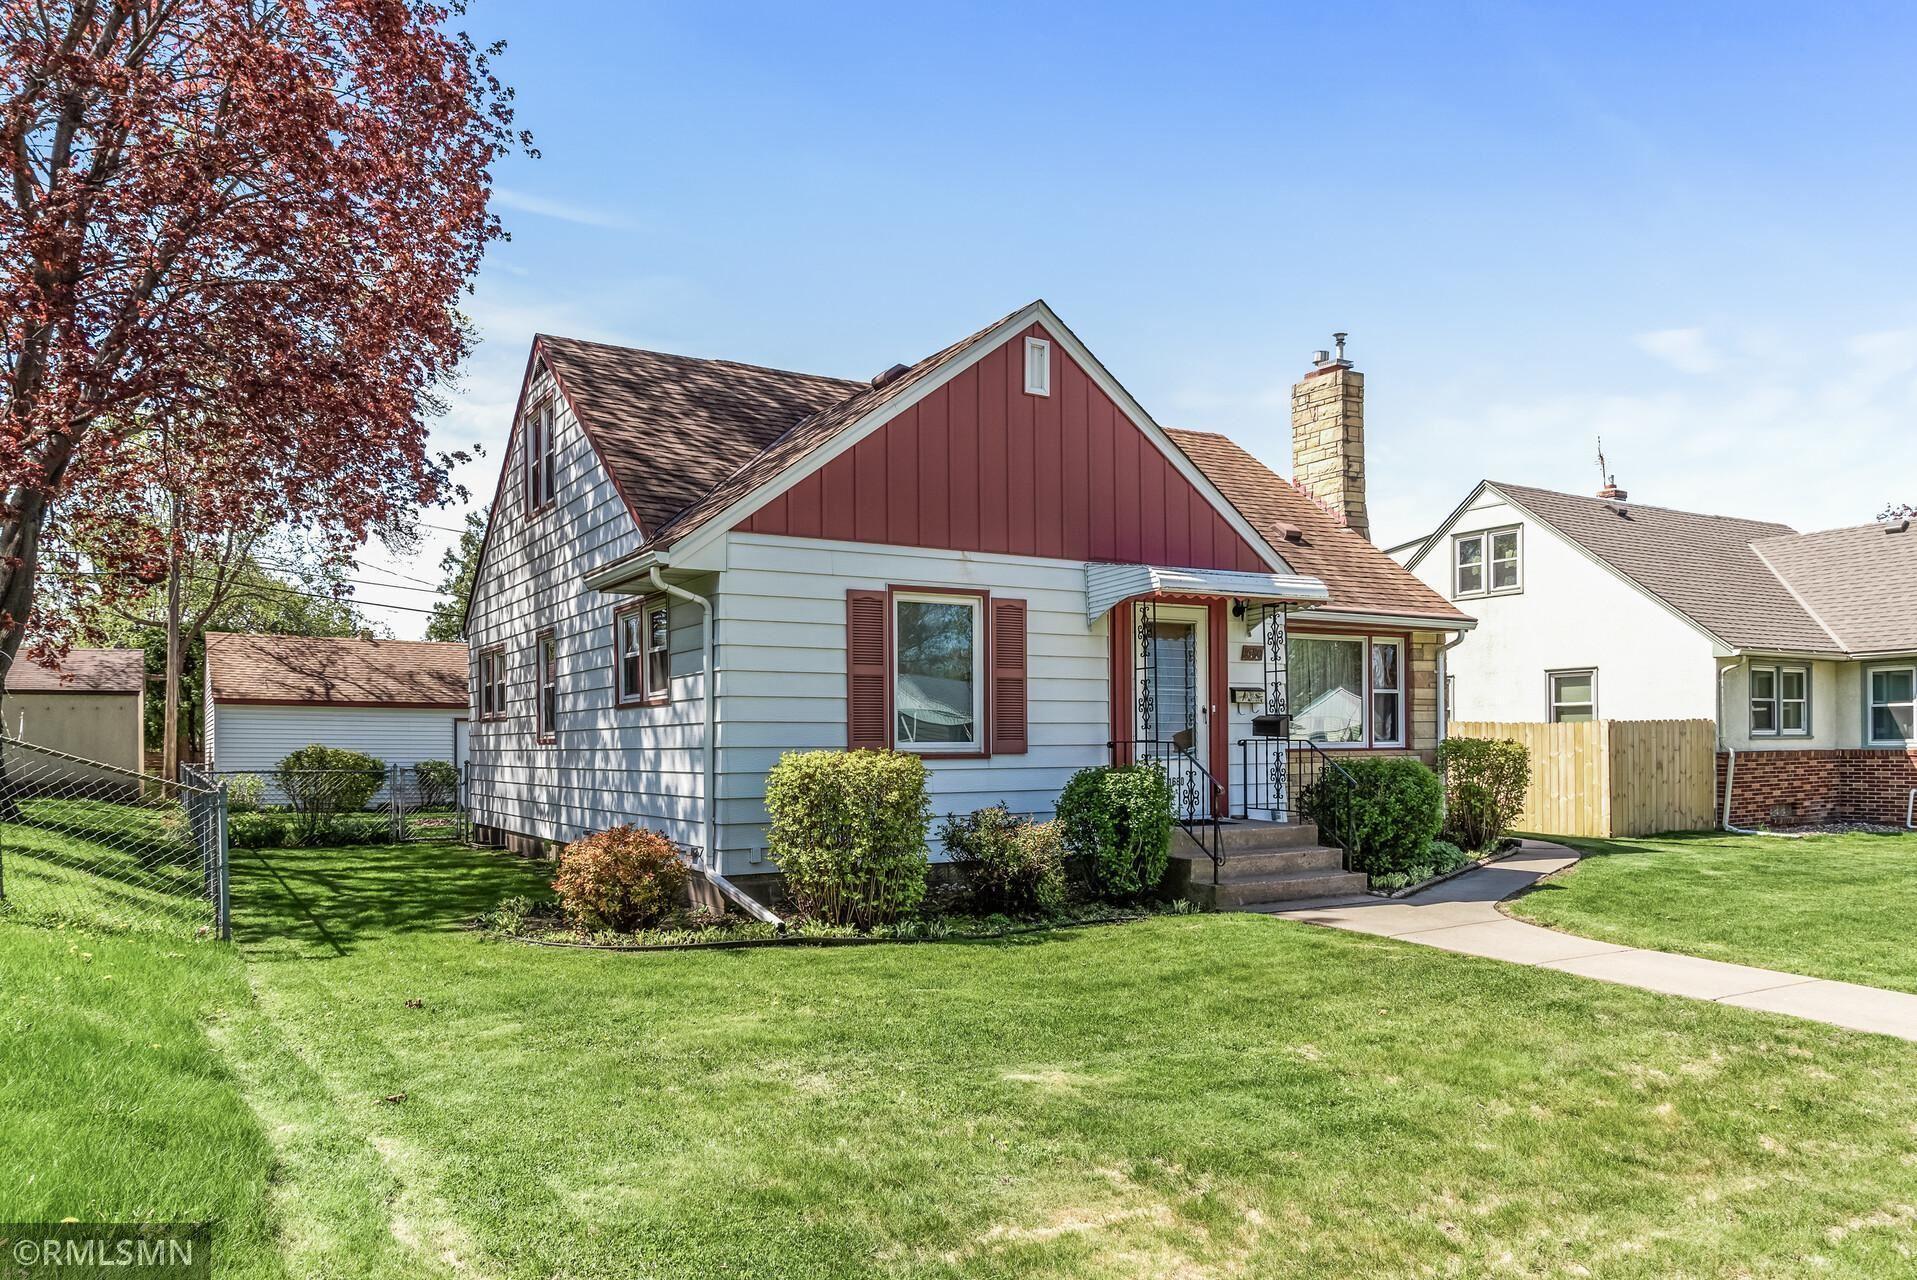 1680 Sherwood Avenue, Saint Paul, MN 55106 - MLS#: 5749480